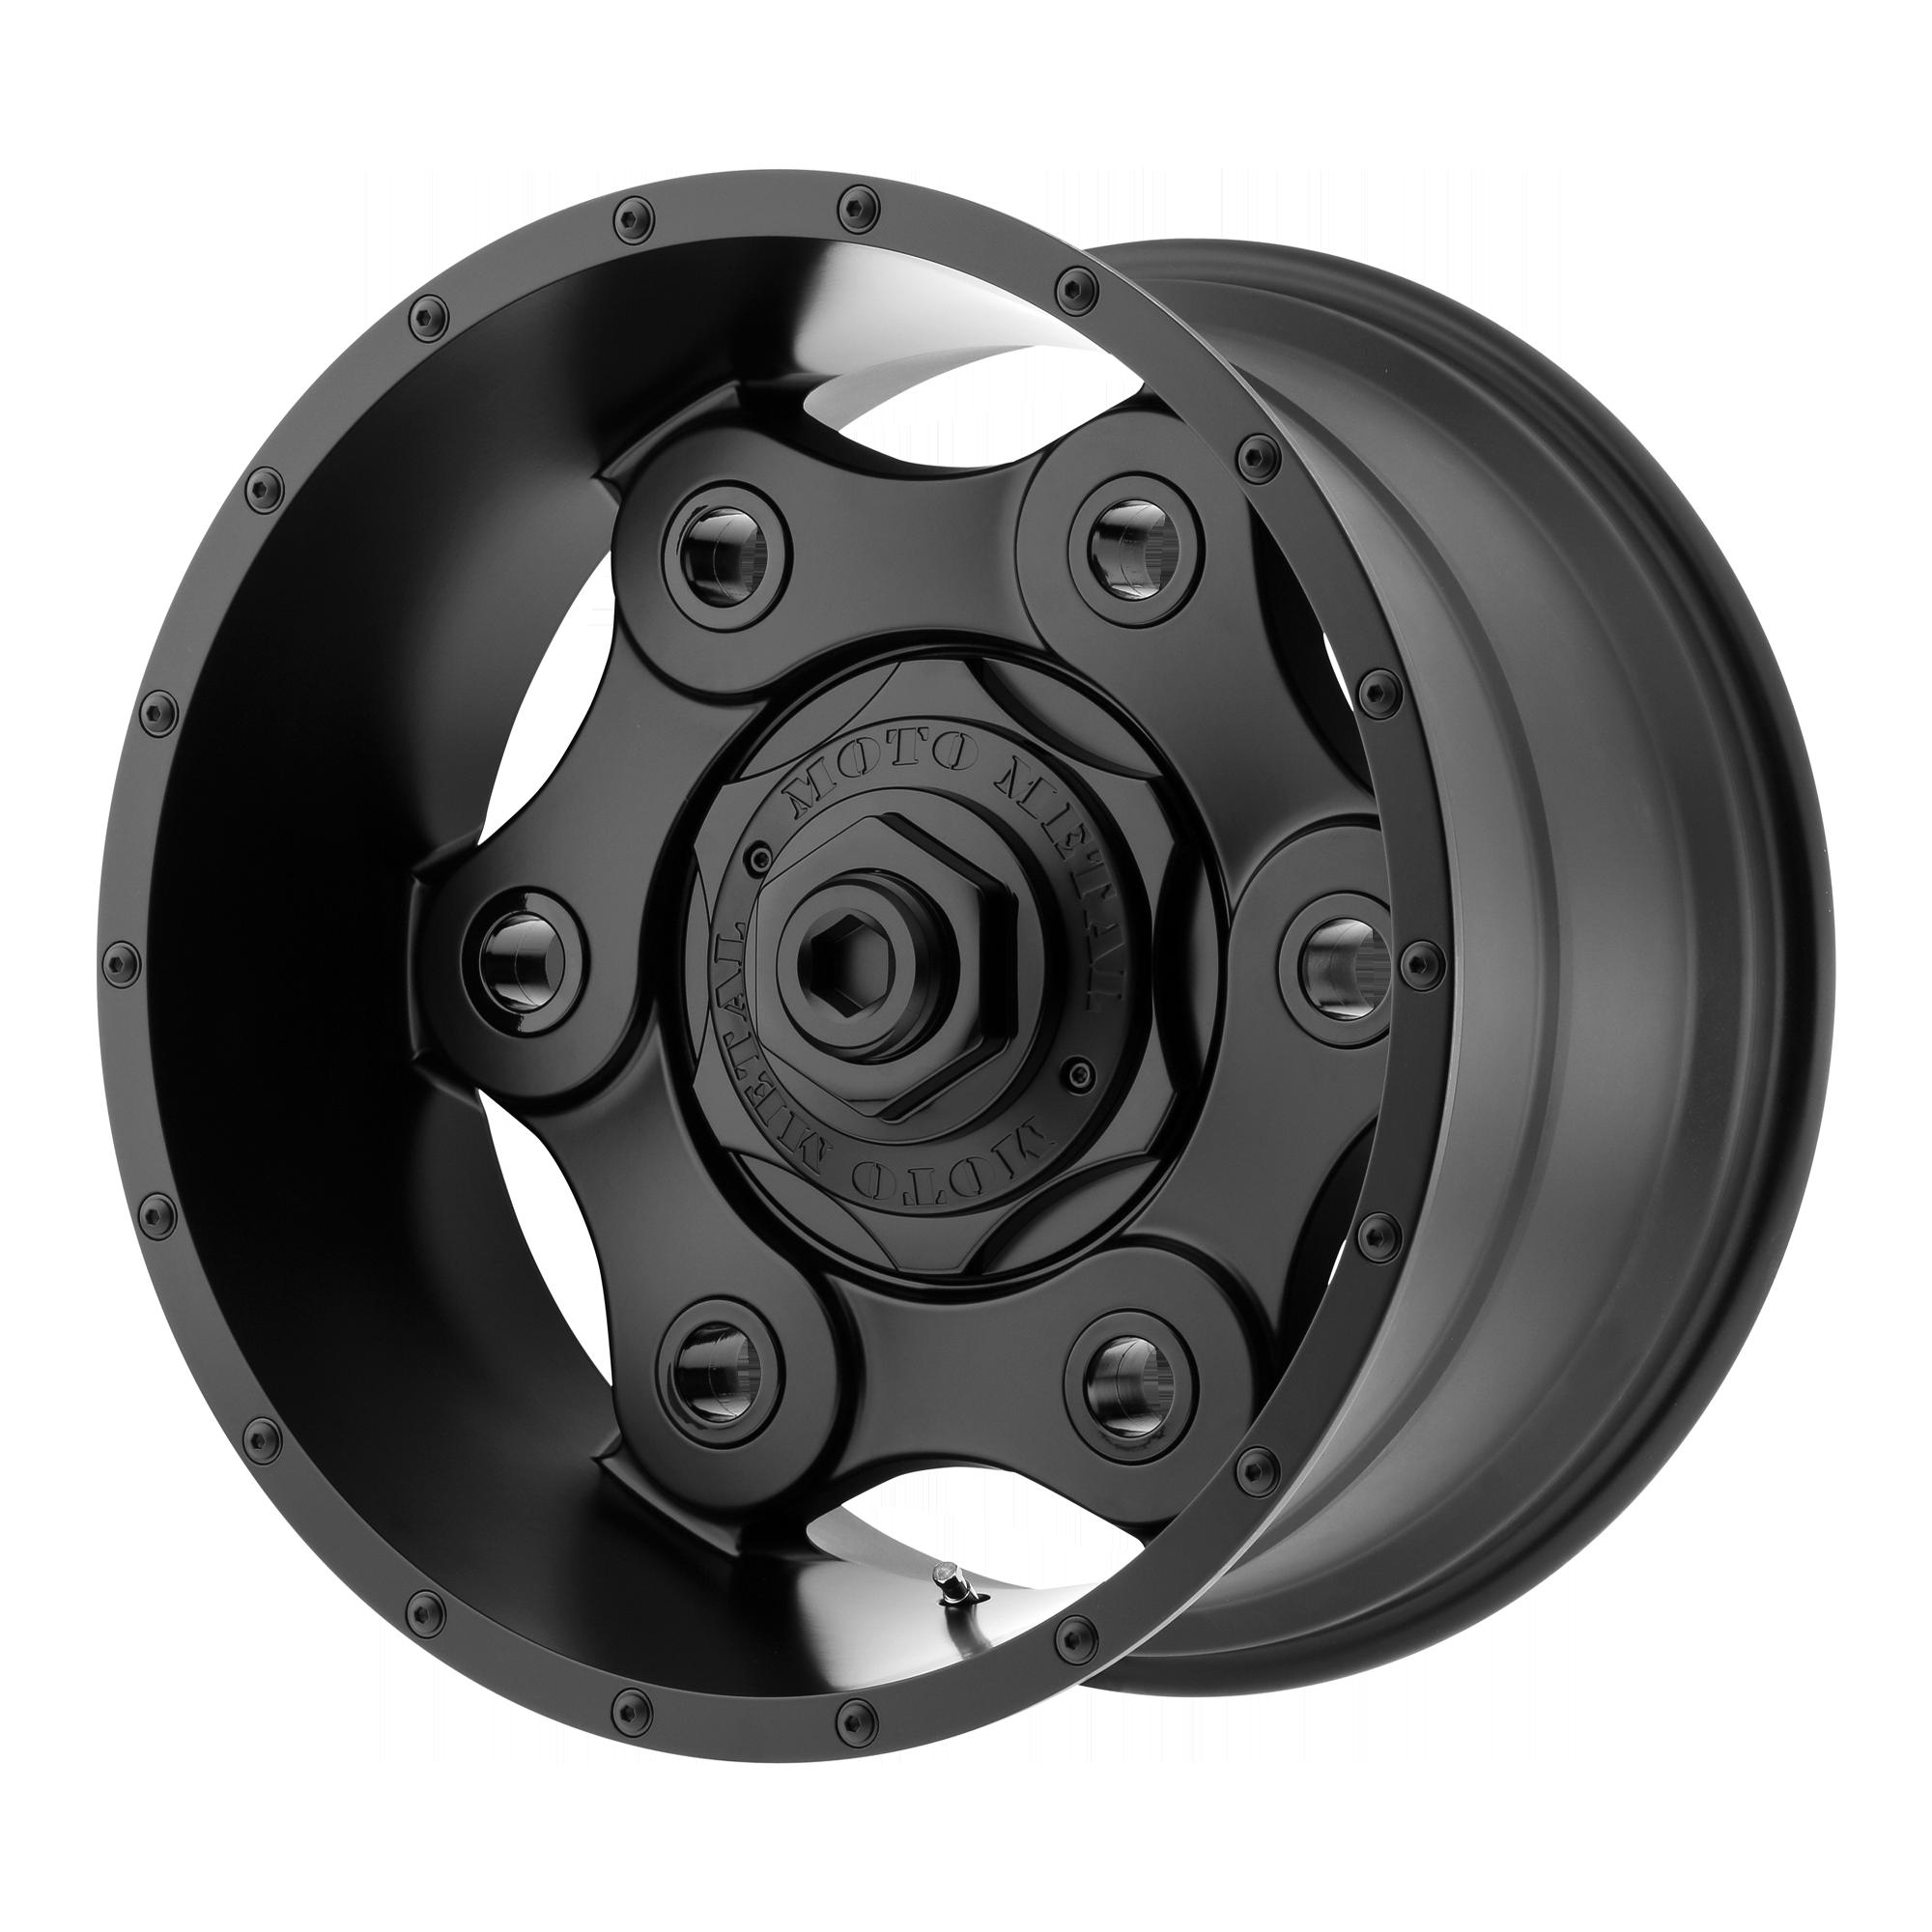 MOTO METAL MO977 LINK hliníkové disky 9x17 6x139,7 ET18 Black Out